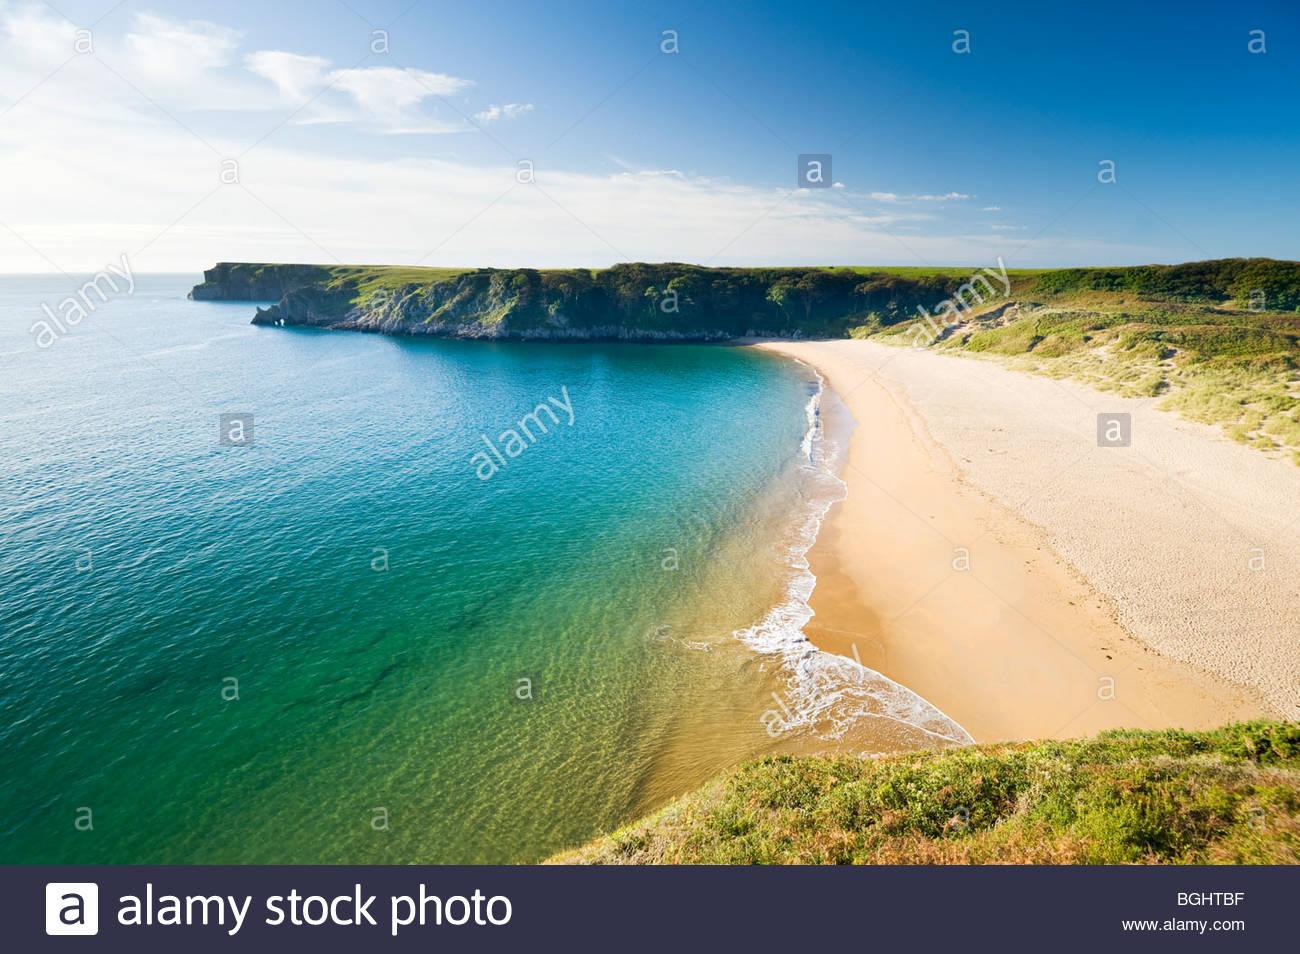 Barafundle Bay, Pembrokeshire Coast National Park, South Wales, UK. - Stock Image